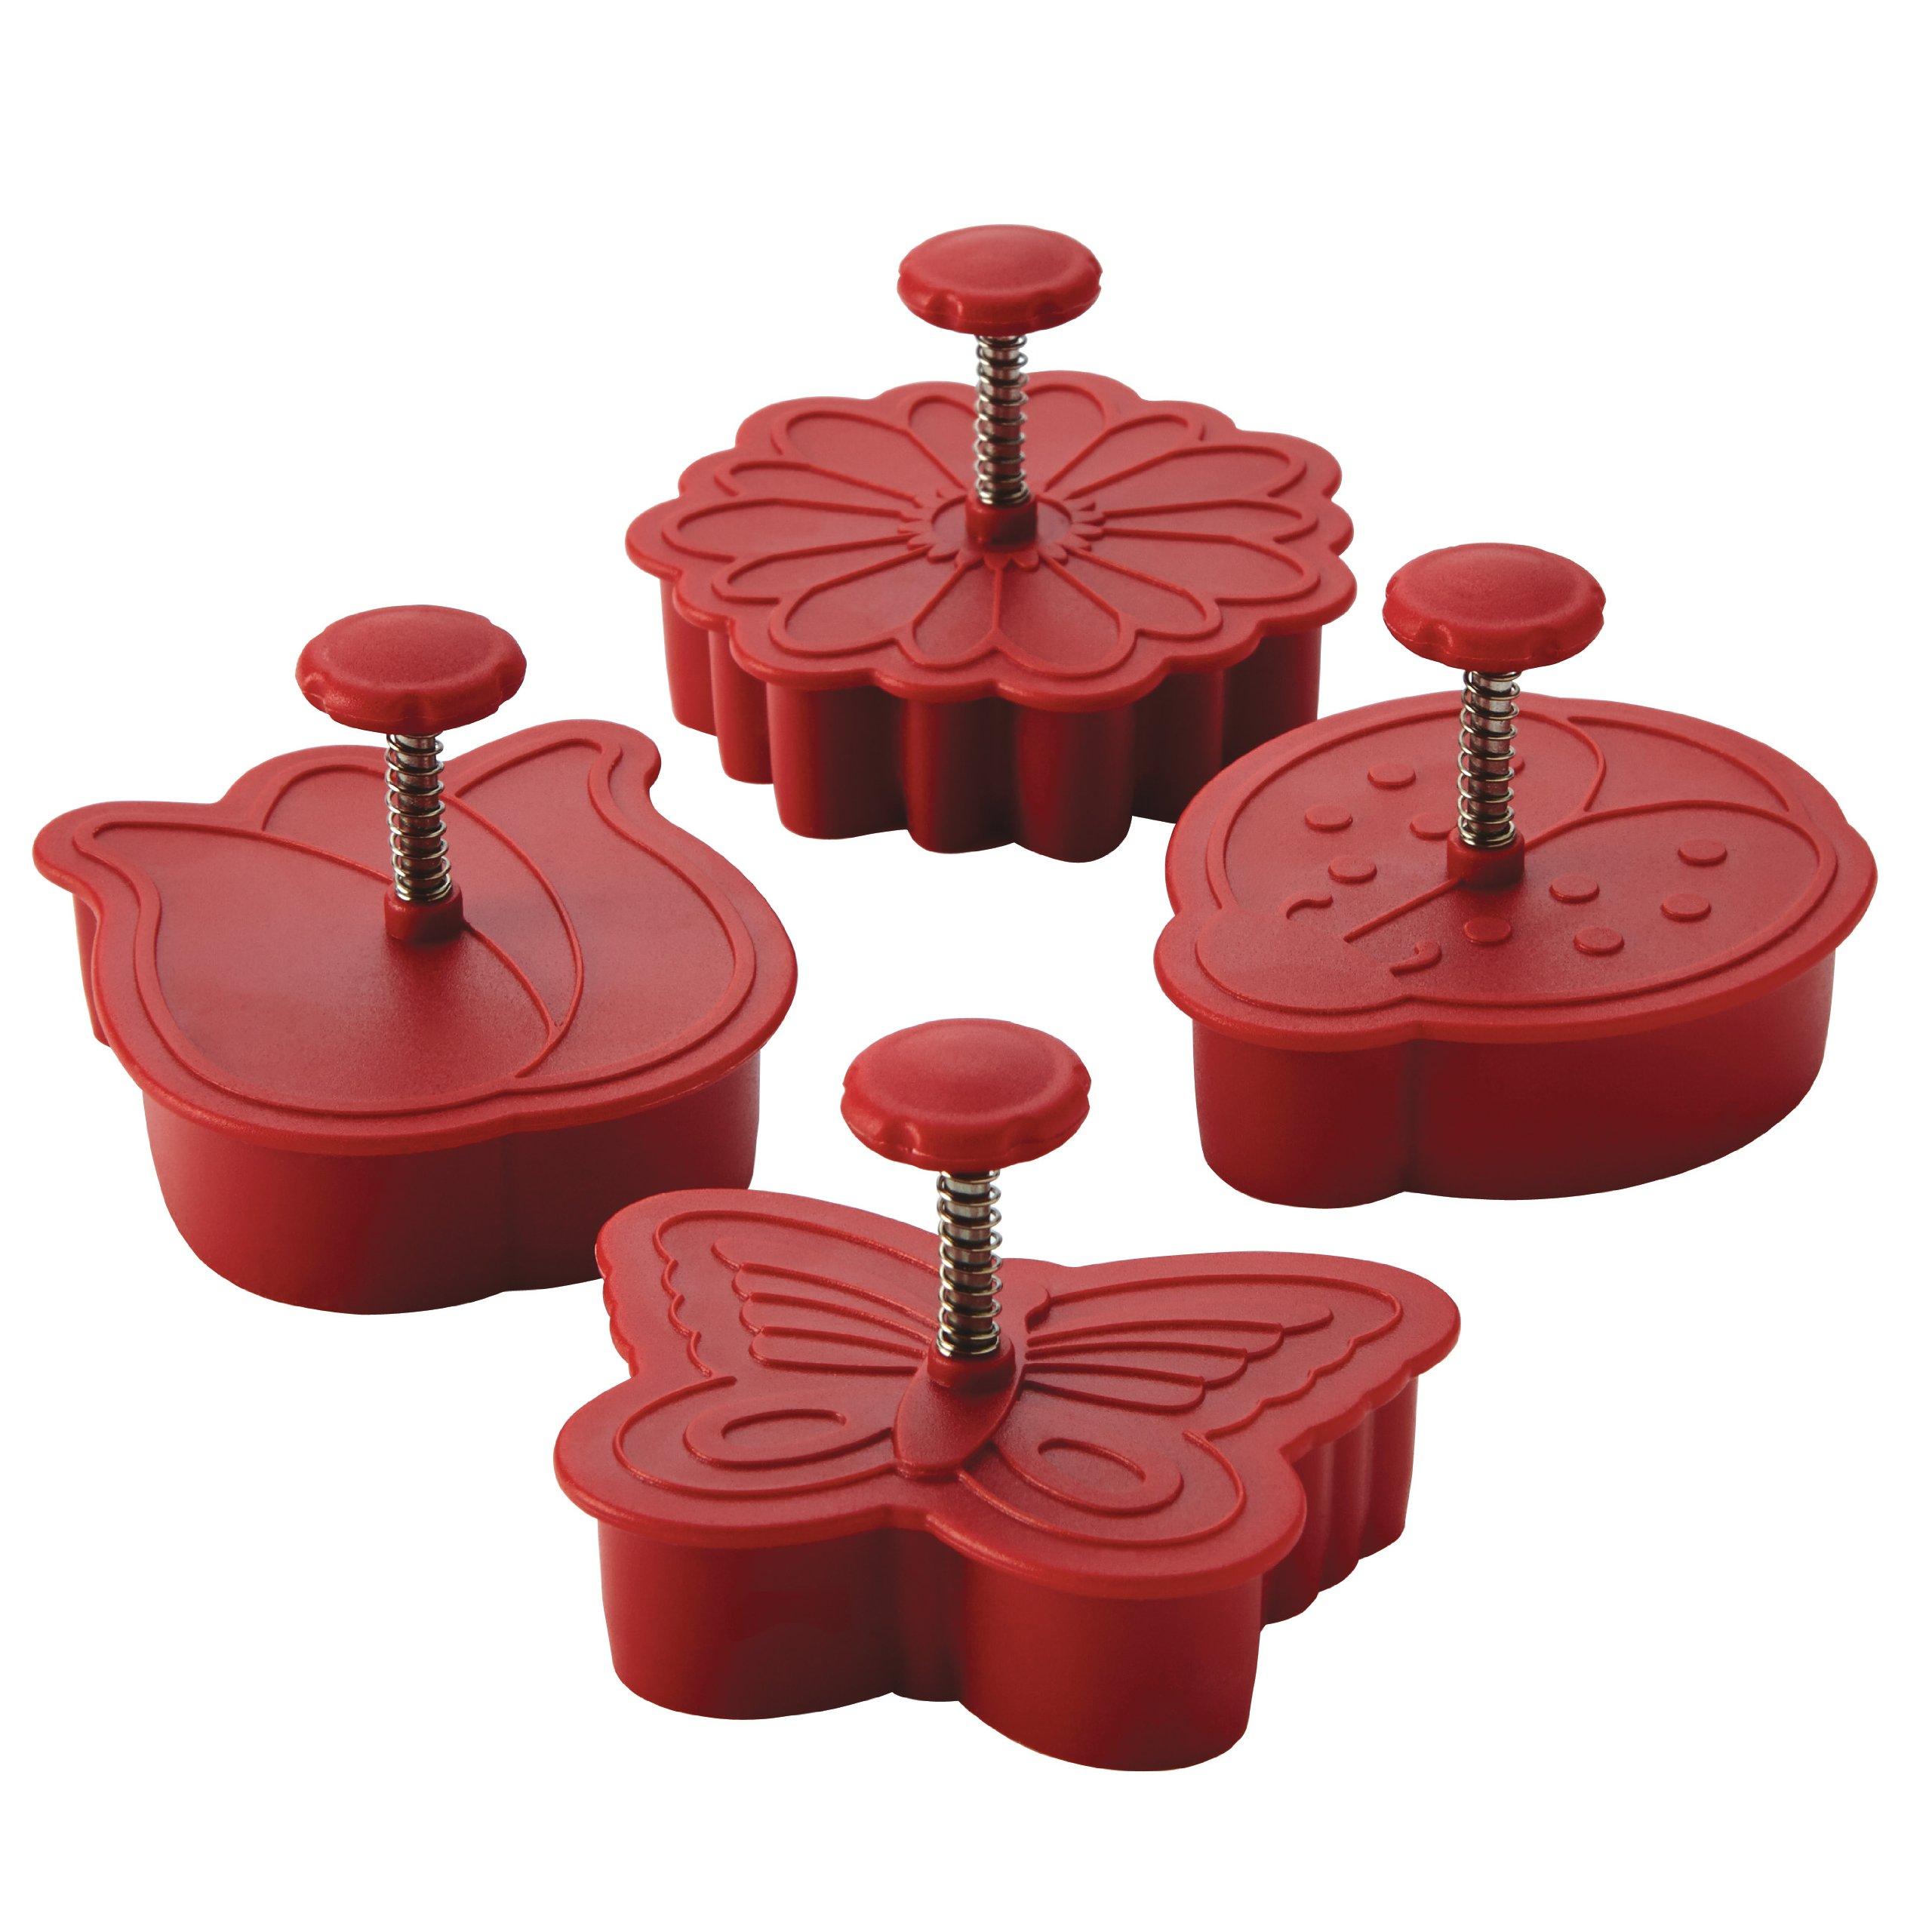 Cake Boss Decorating Tools 4-Piece Springtime Fondant Press Set, Red